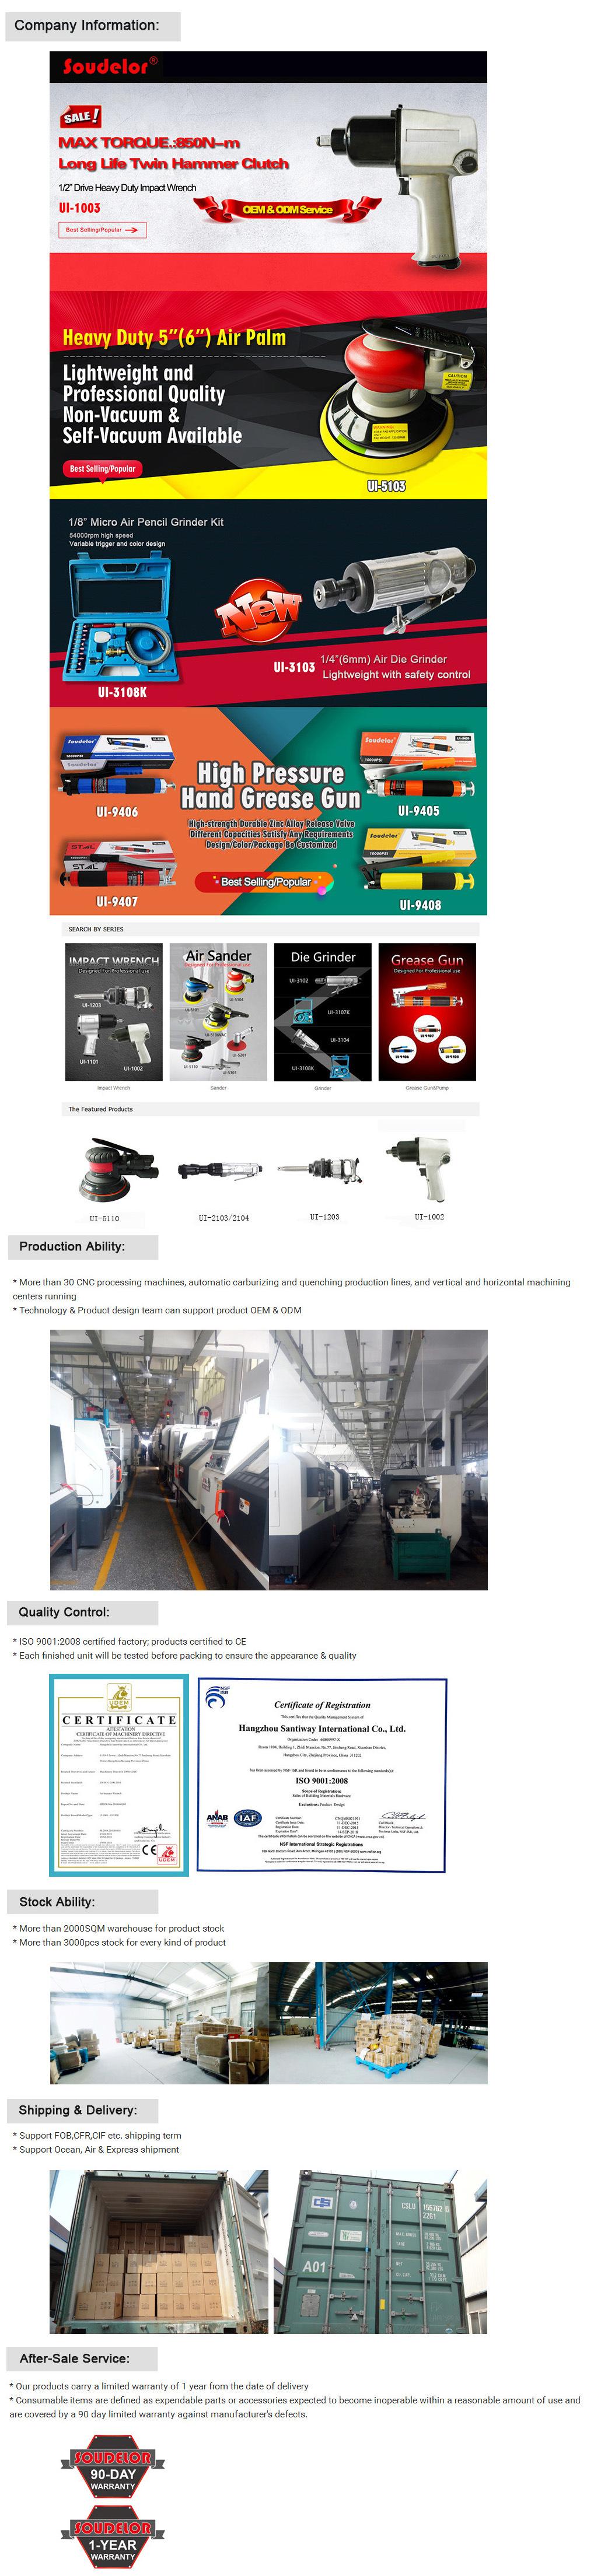 125mm (152mm) Sanding Pad Pneumatic Tools Air Orbital Sander Ui-510804